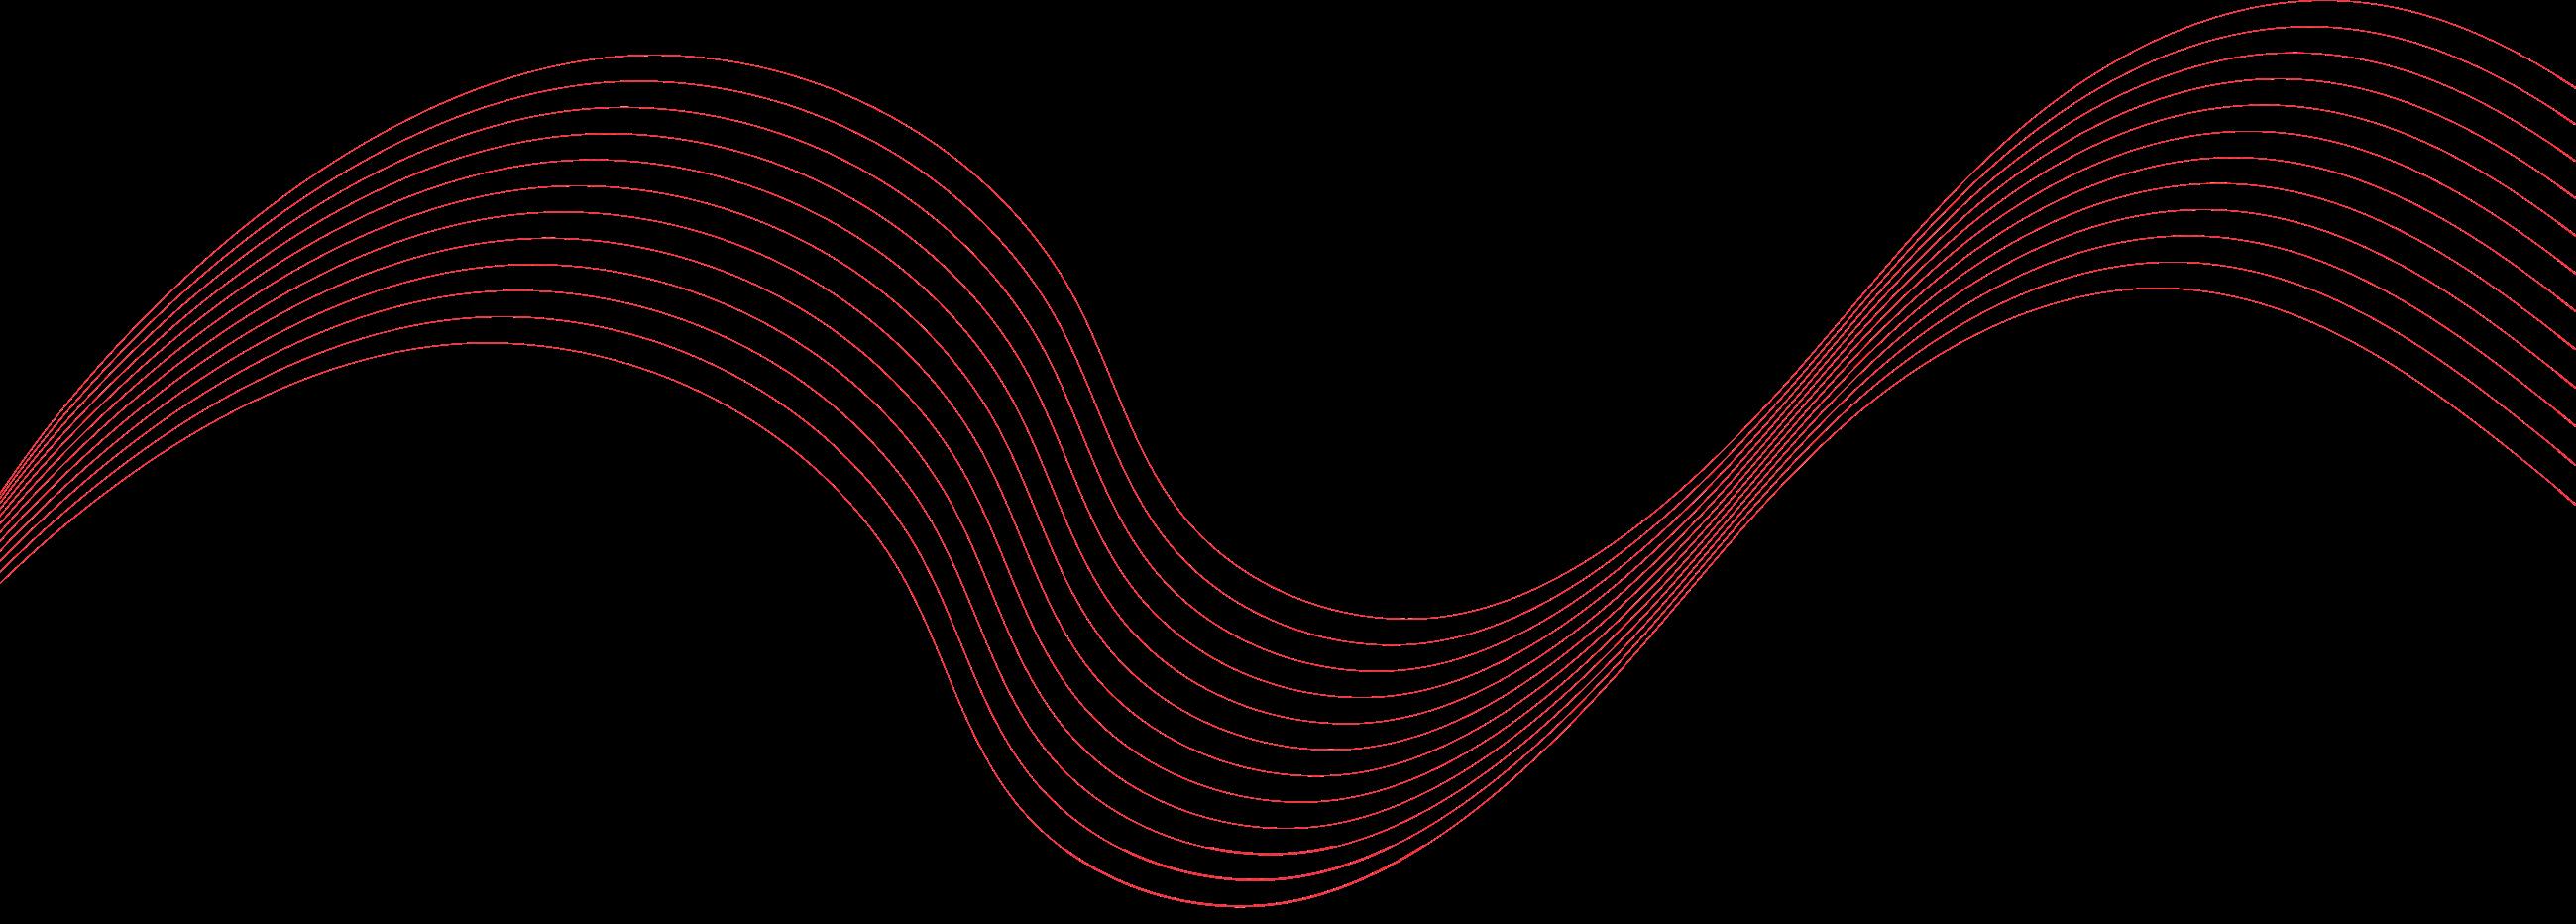 line 2 4